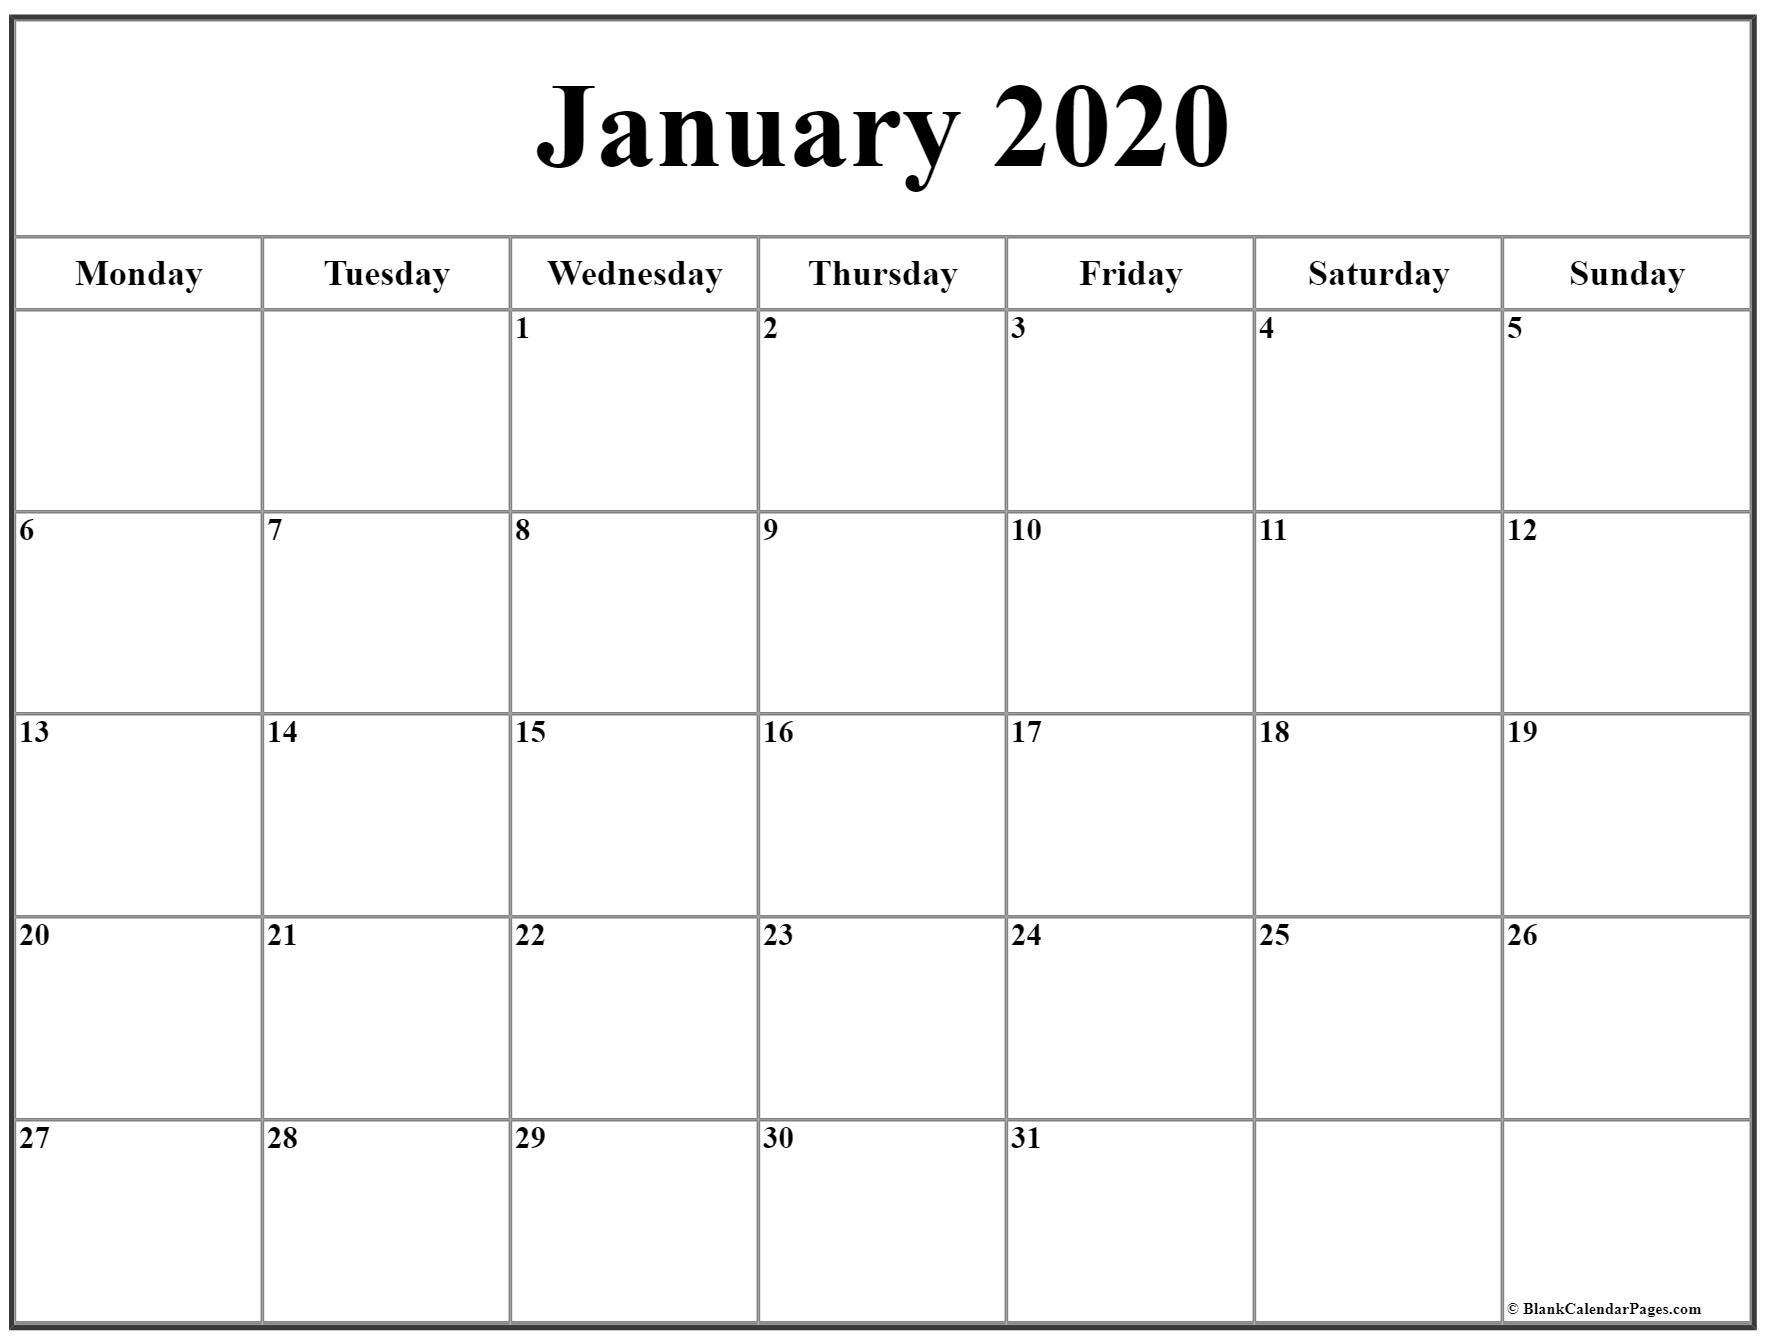 January 2020 Monday Calendar   Monday To Sunday in January 2020 Calendar Starting Monday